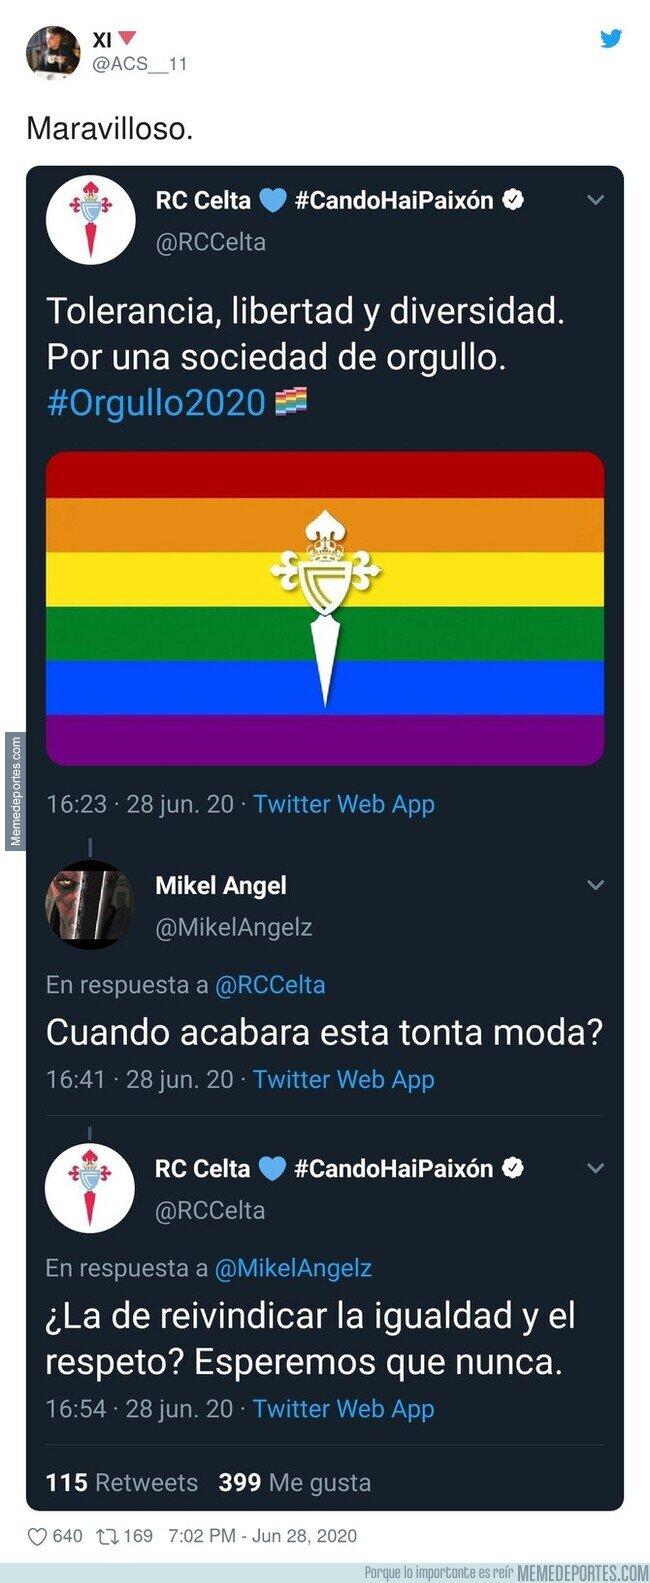 1107942 - El ZASCA monumental del Celta de Vigo a un intolerante que se quejó tras poner la bandera LGTB el club vigués